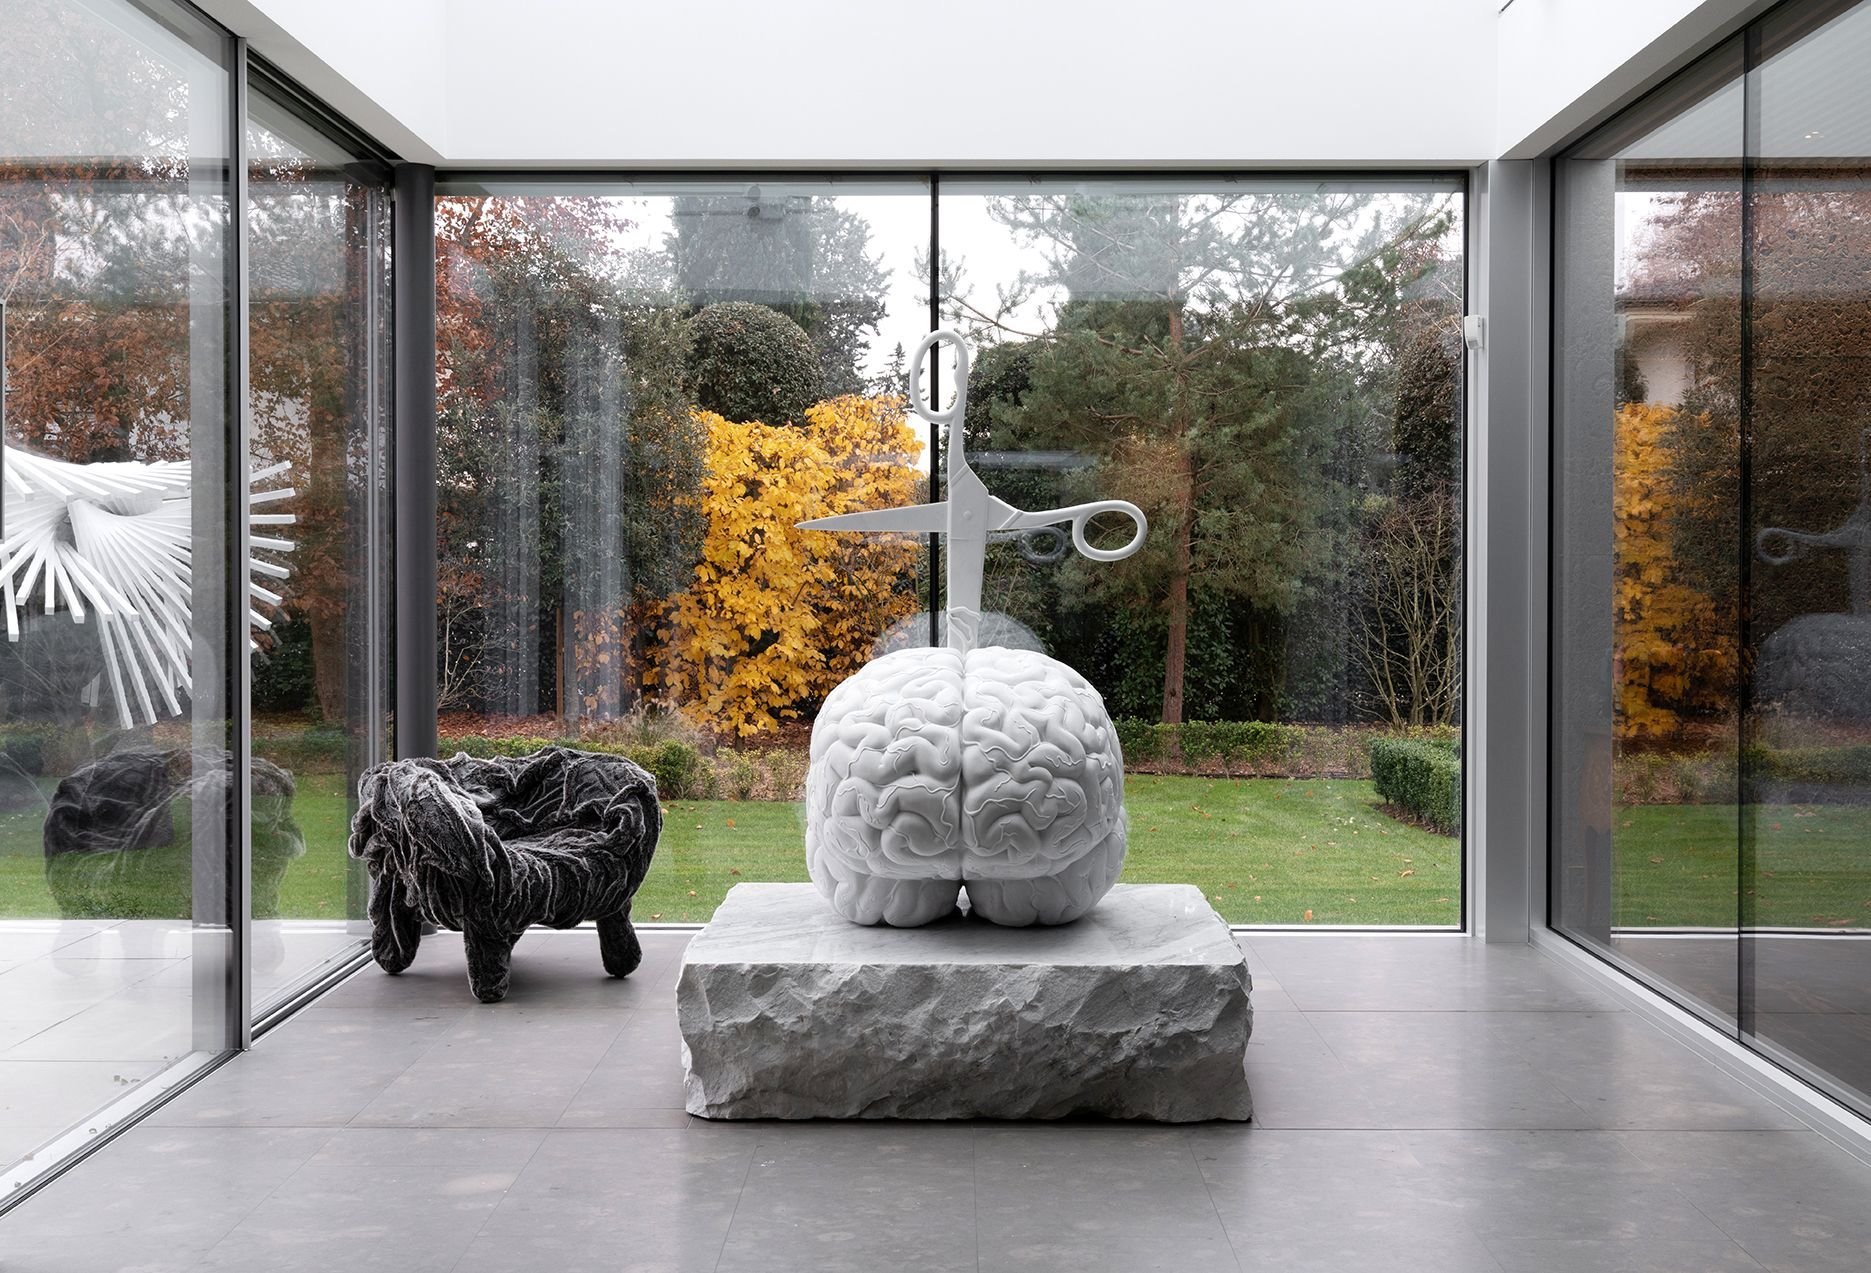 Villa in Svizzera - image 12